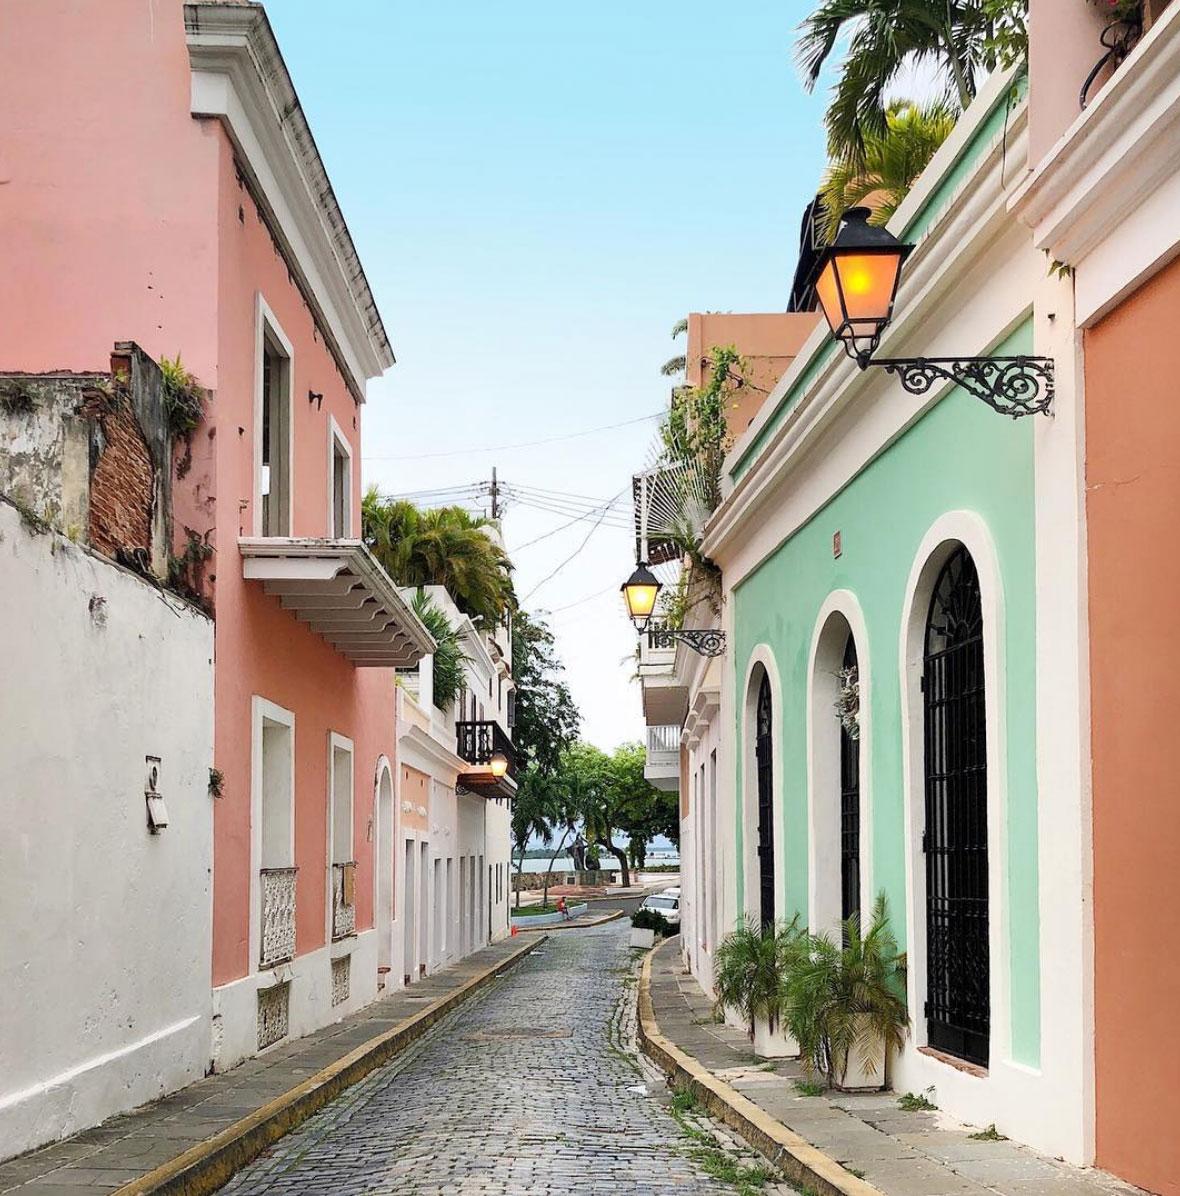 Pintoresque streets in San Juan, Puerto Rico